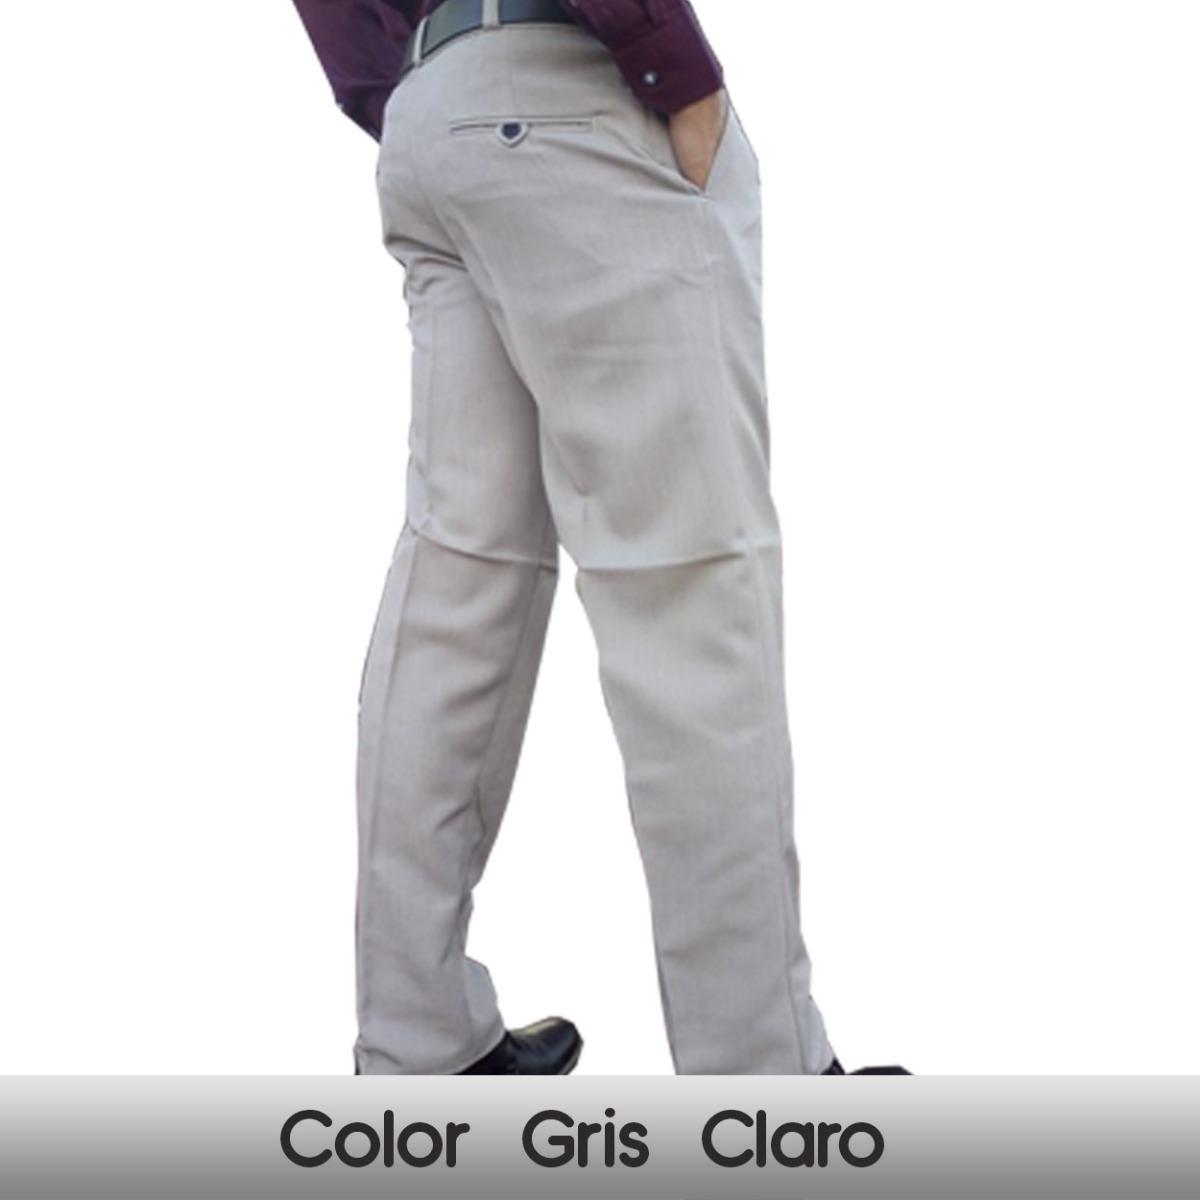 Lote De 3 Pantalones De Vestir Caballero Envio Gratis -   600.00 en ... 768d1c644d8